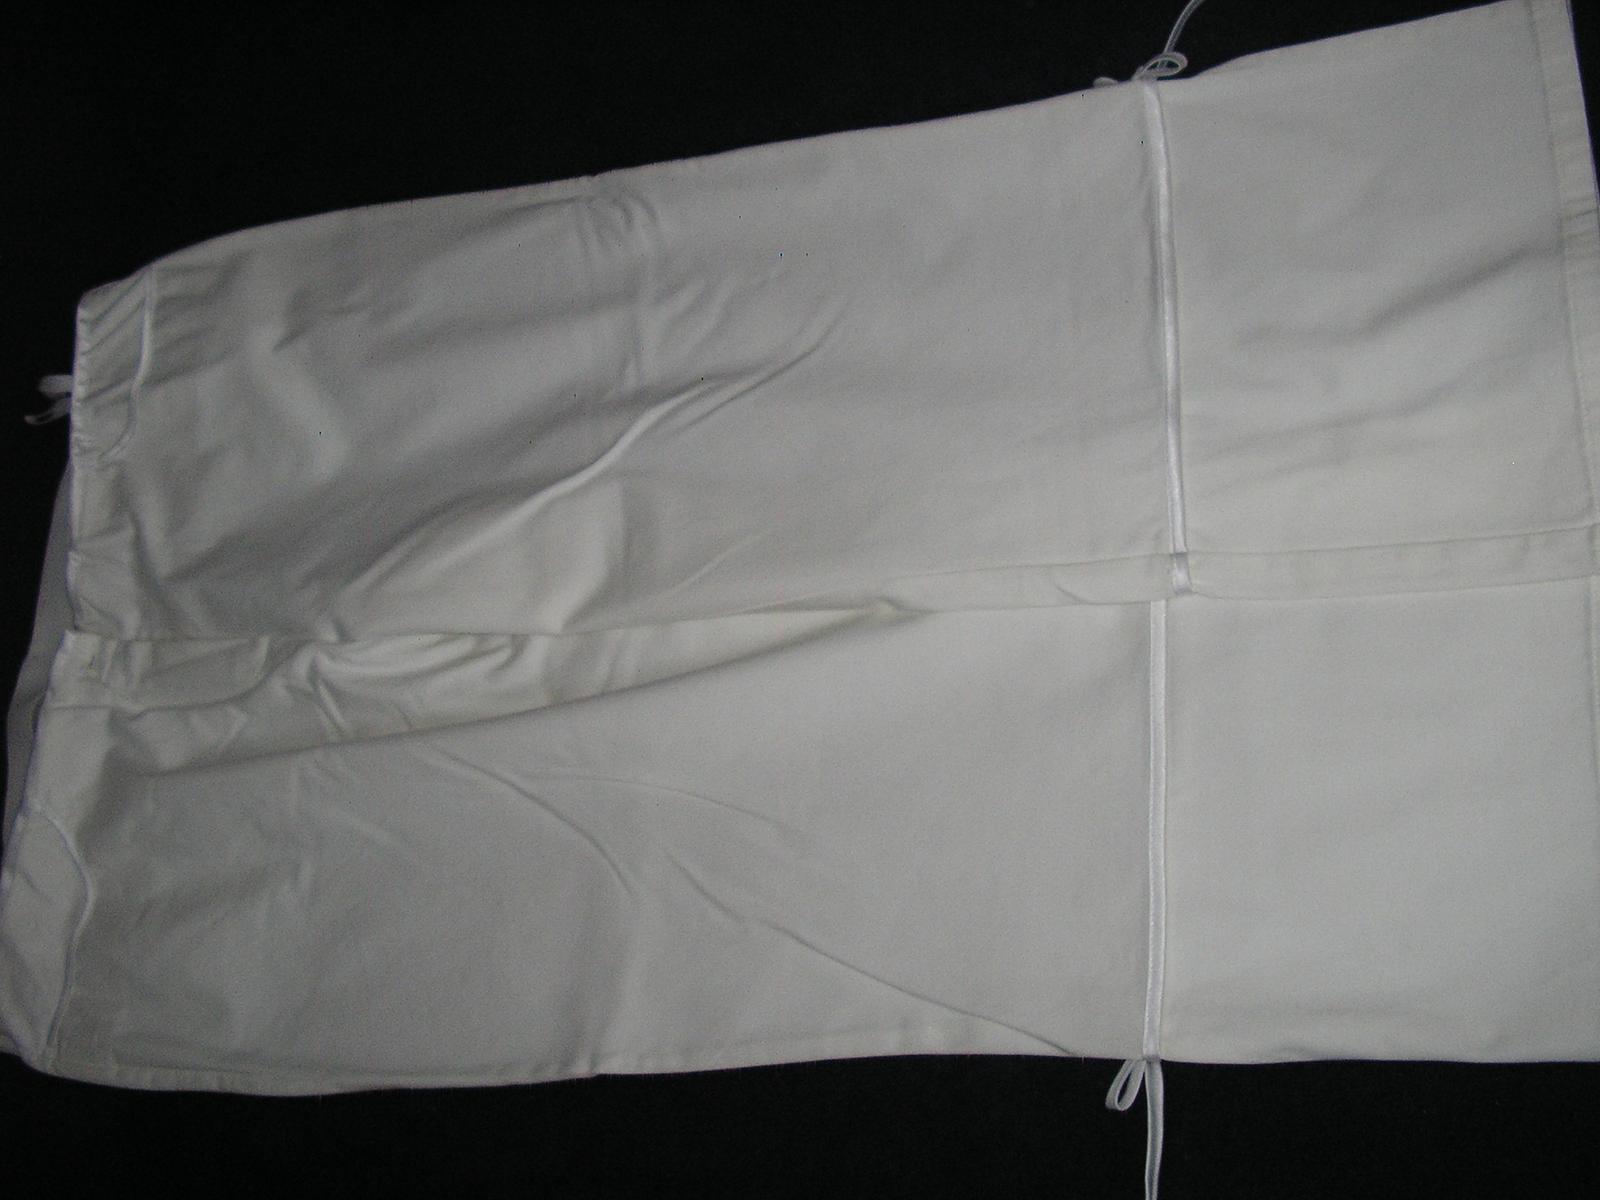 684. BONPRIX Biele nohavice     - Obrázok č. 1